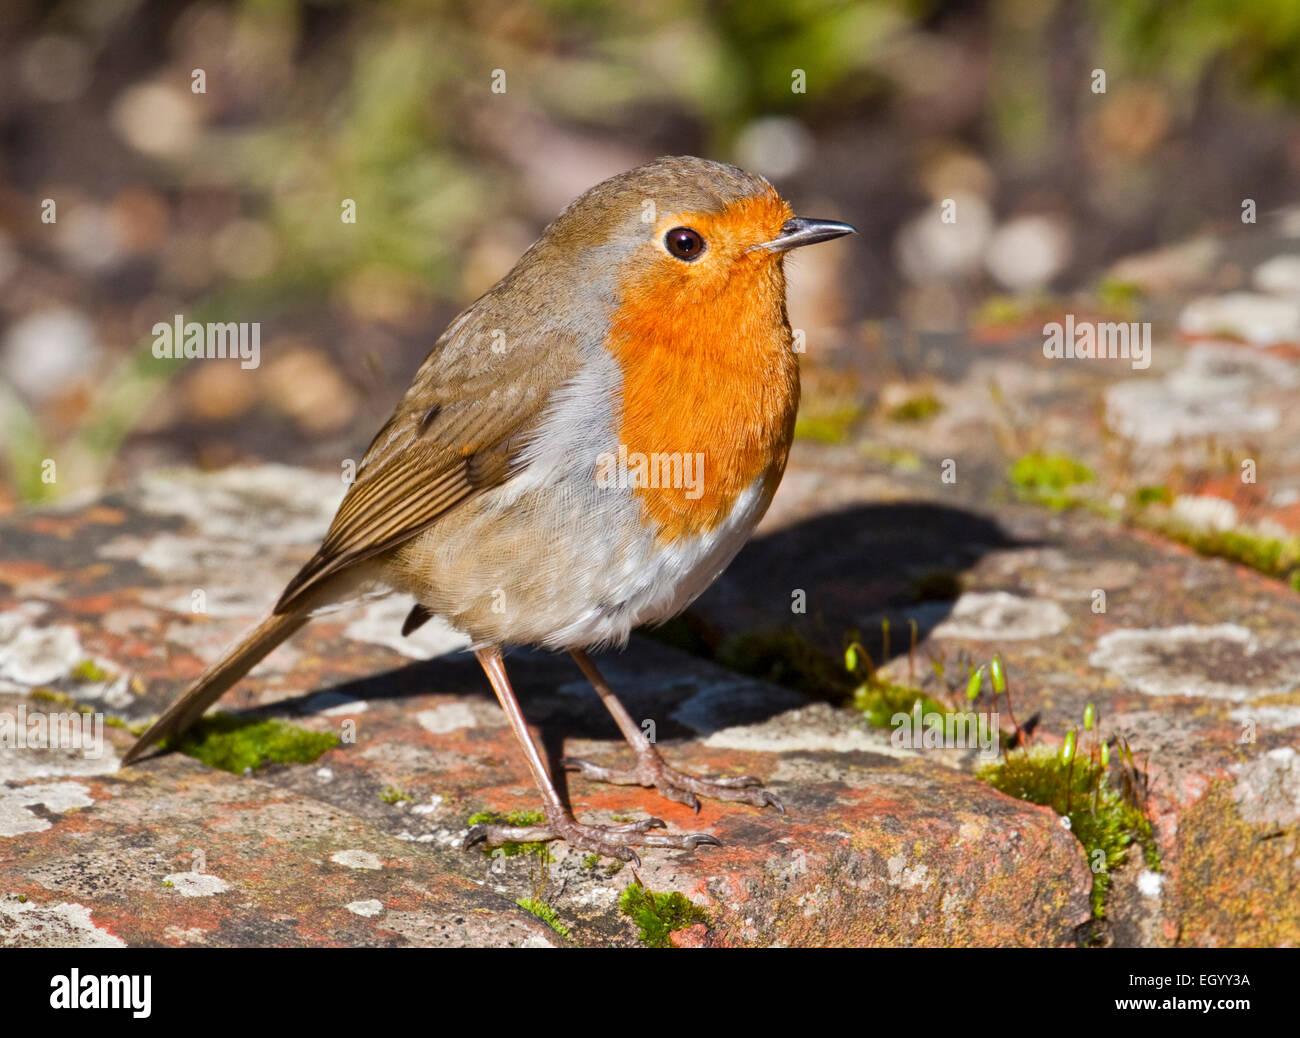 European Robin (erithacus rubecula), UK - Stock Image